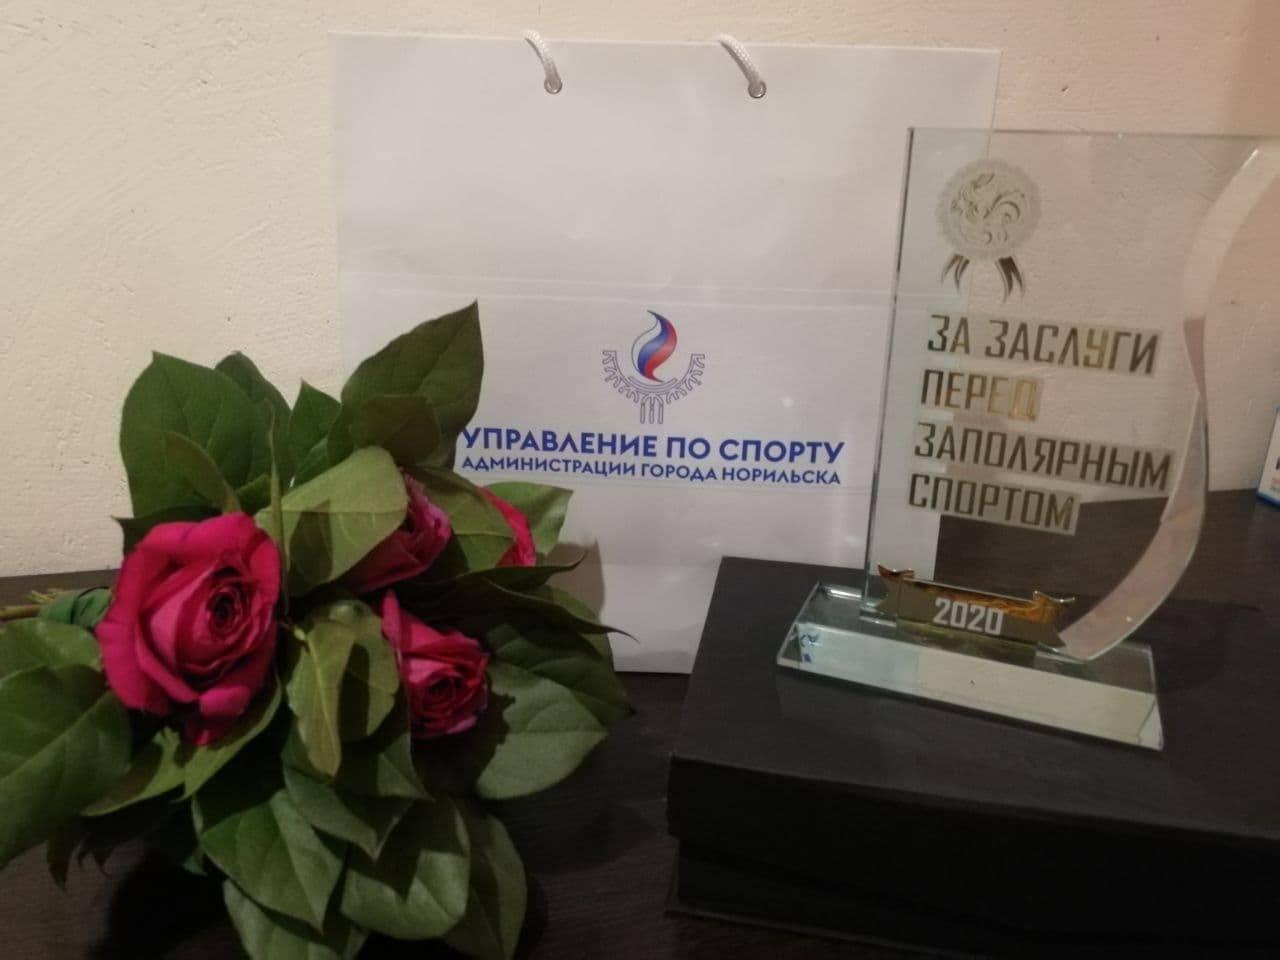 Председатель Комитета РСПП-Заполярье награждена за развитие спорта